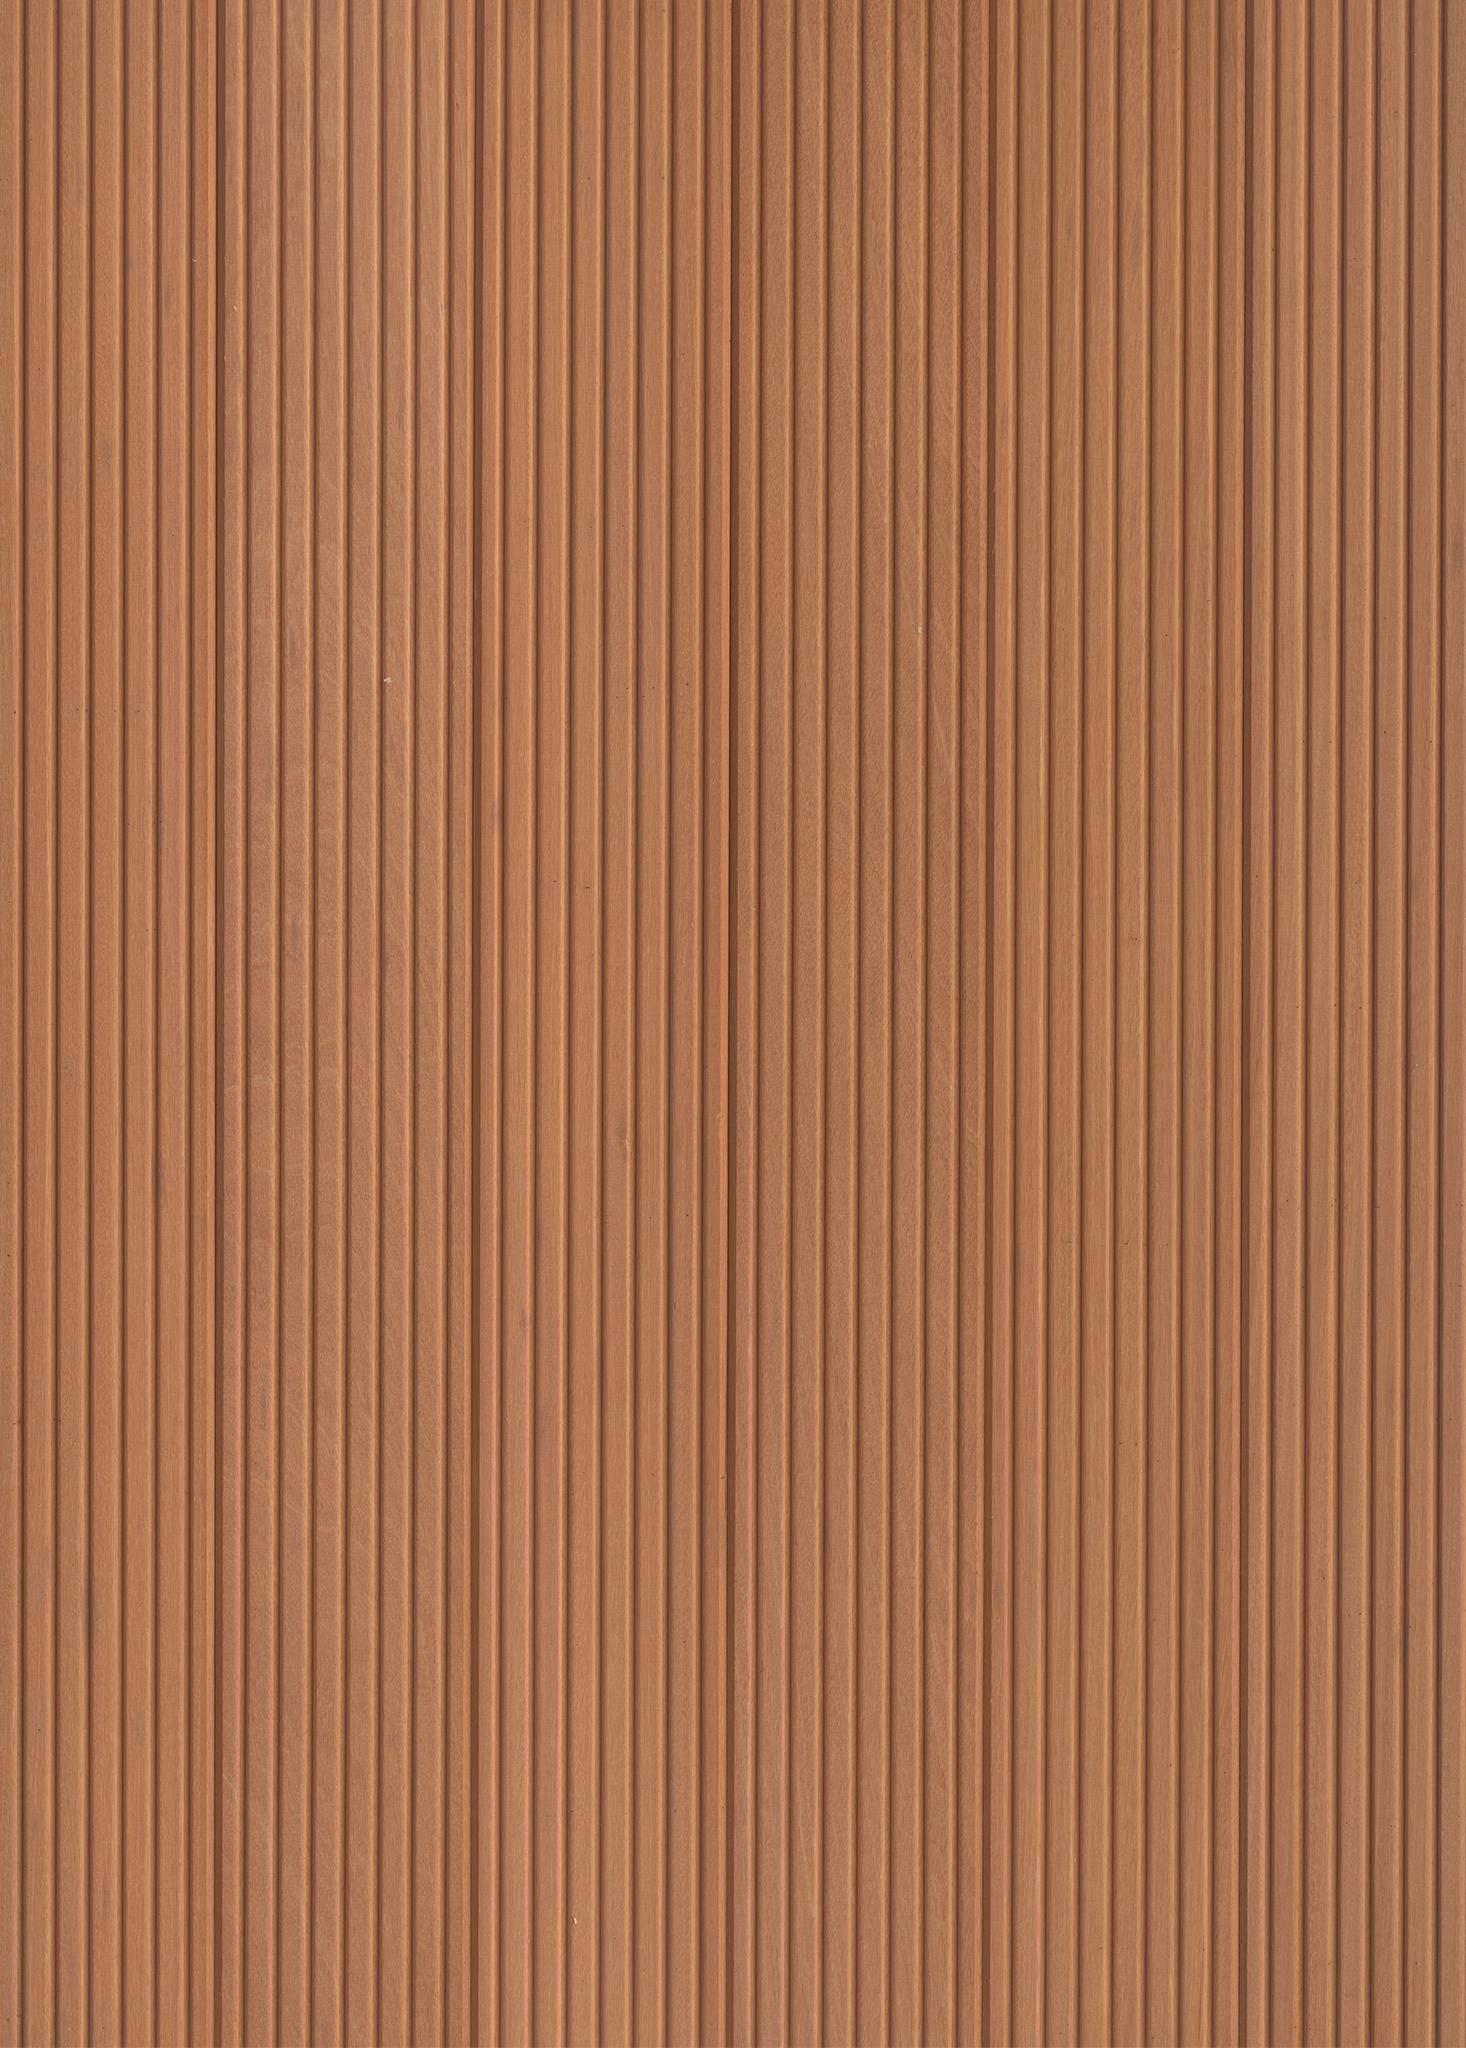 PARAT Deck bangkirai ripple plank 25mm